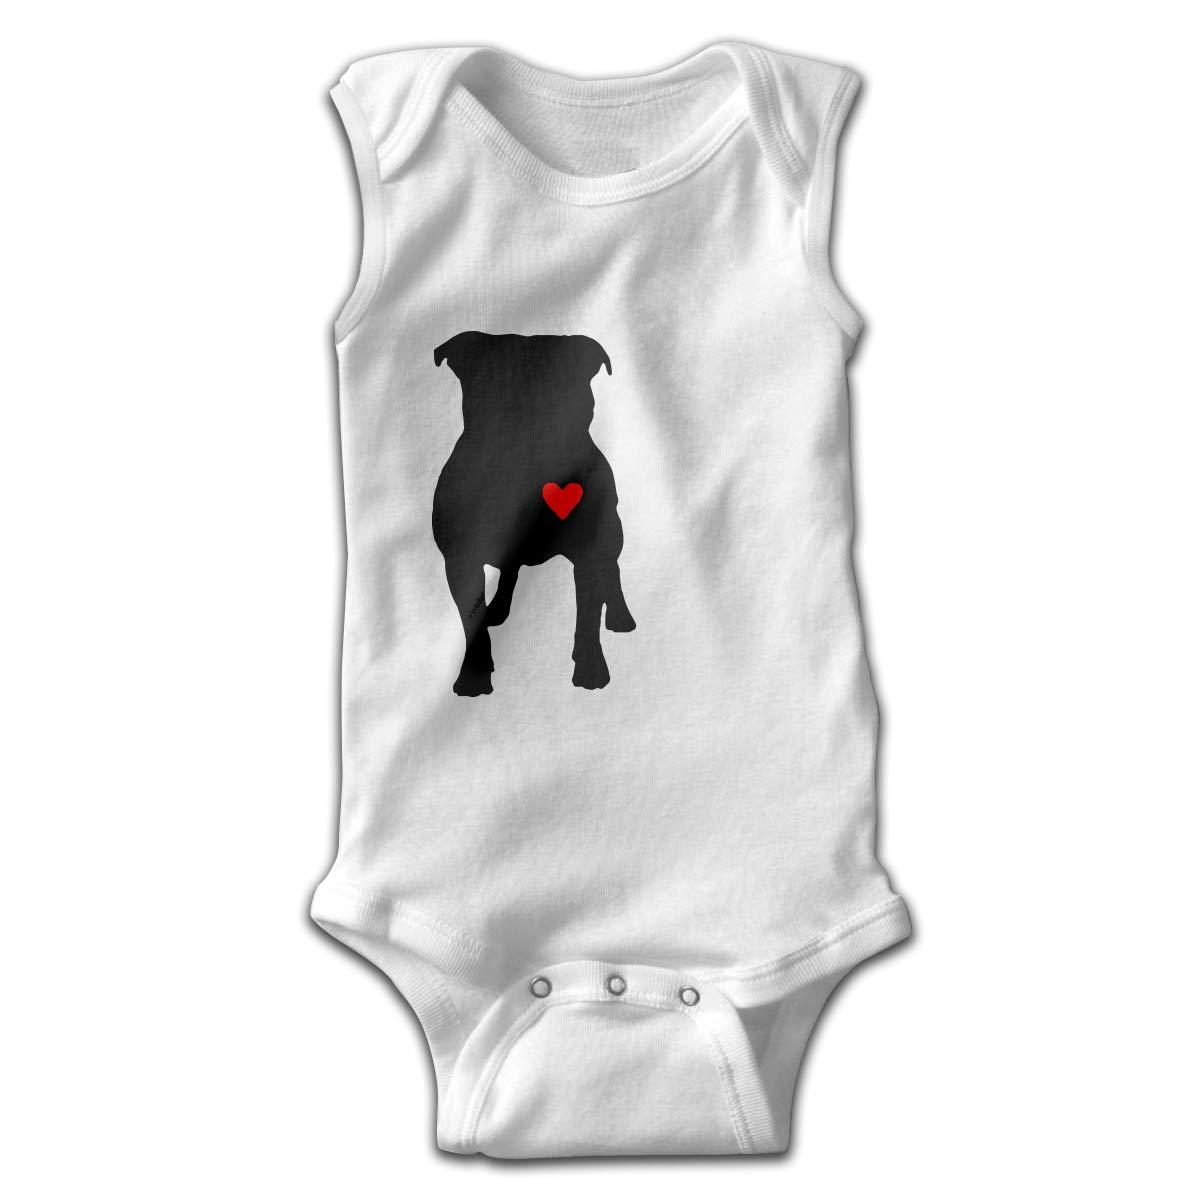 MMSSsJQ6 Pitbull Heart Baby Newborn Infant Creeper Sleeveless Romper Bodysuit Rompers Jumpsuit